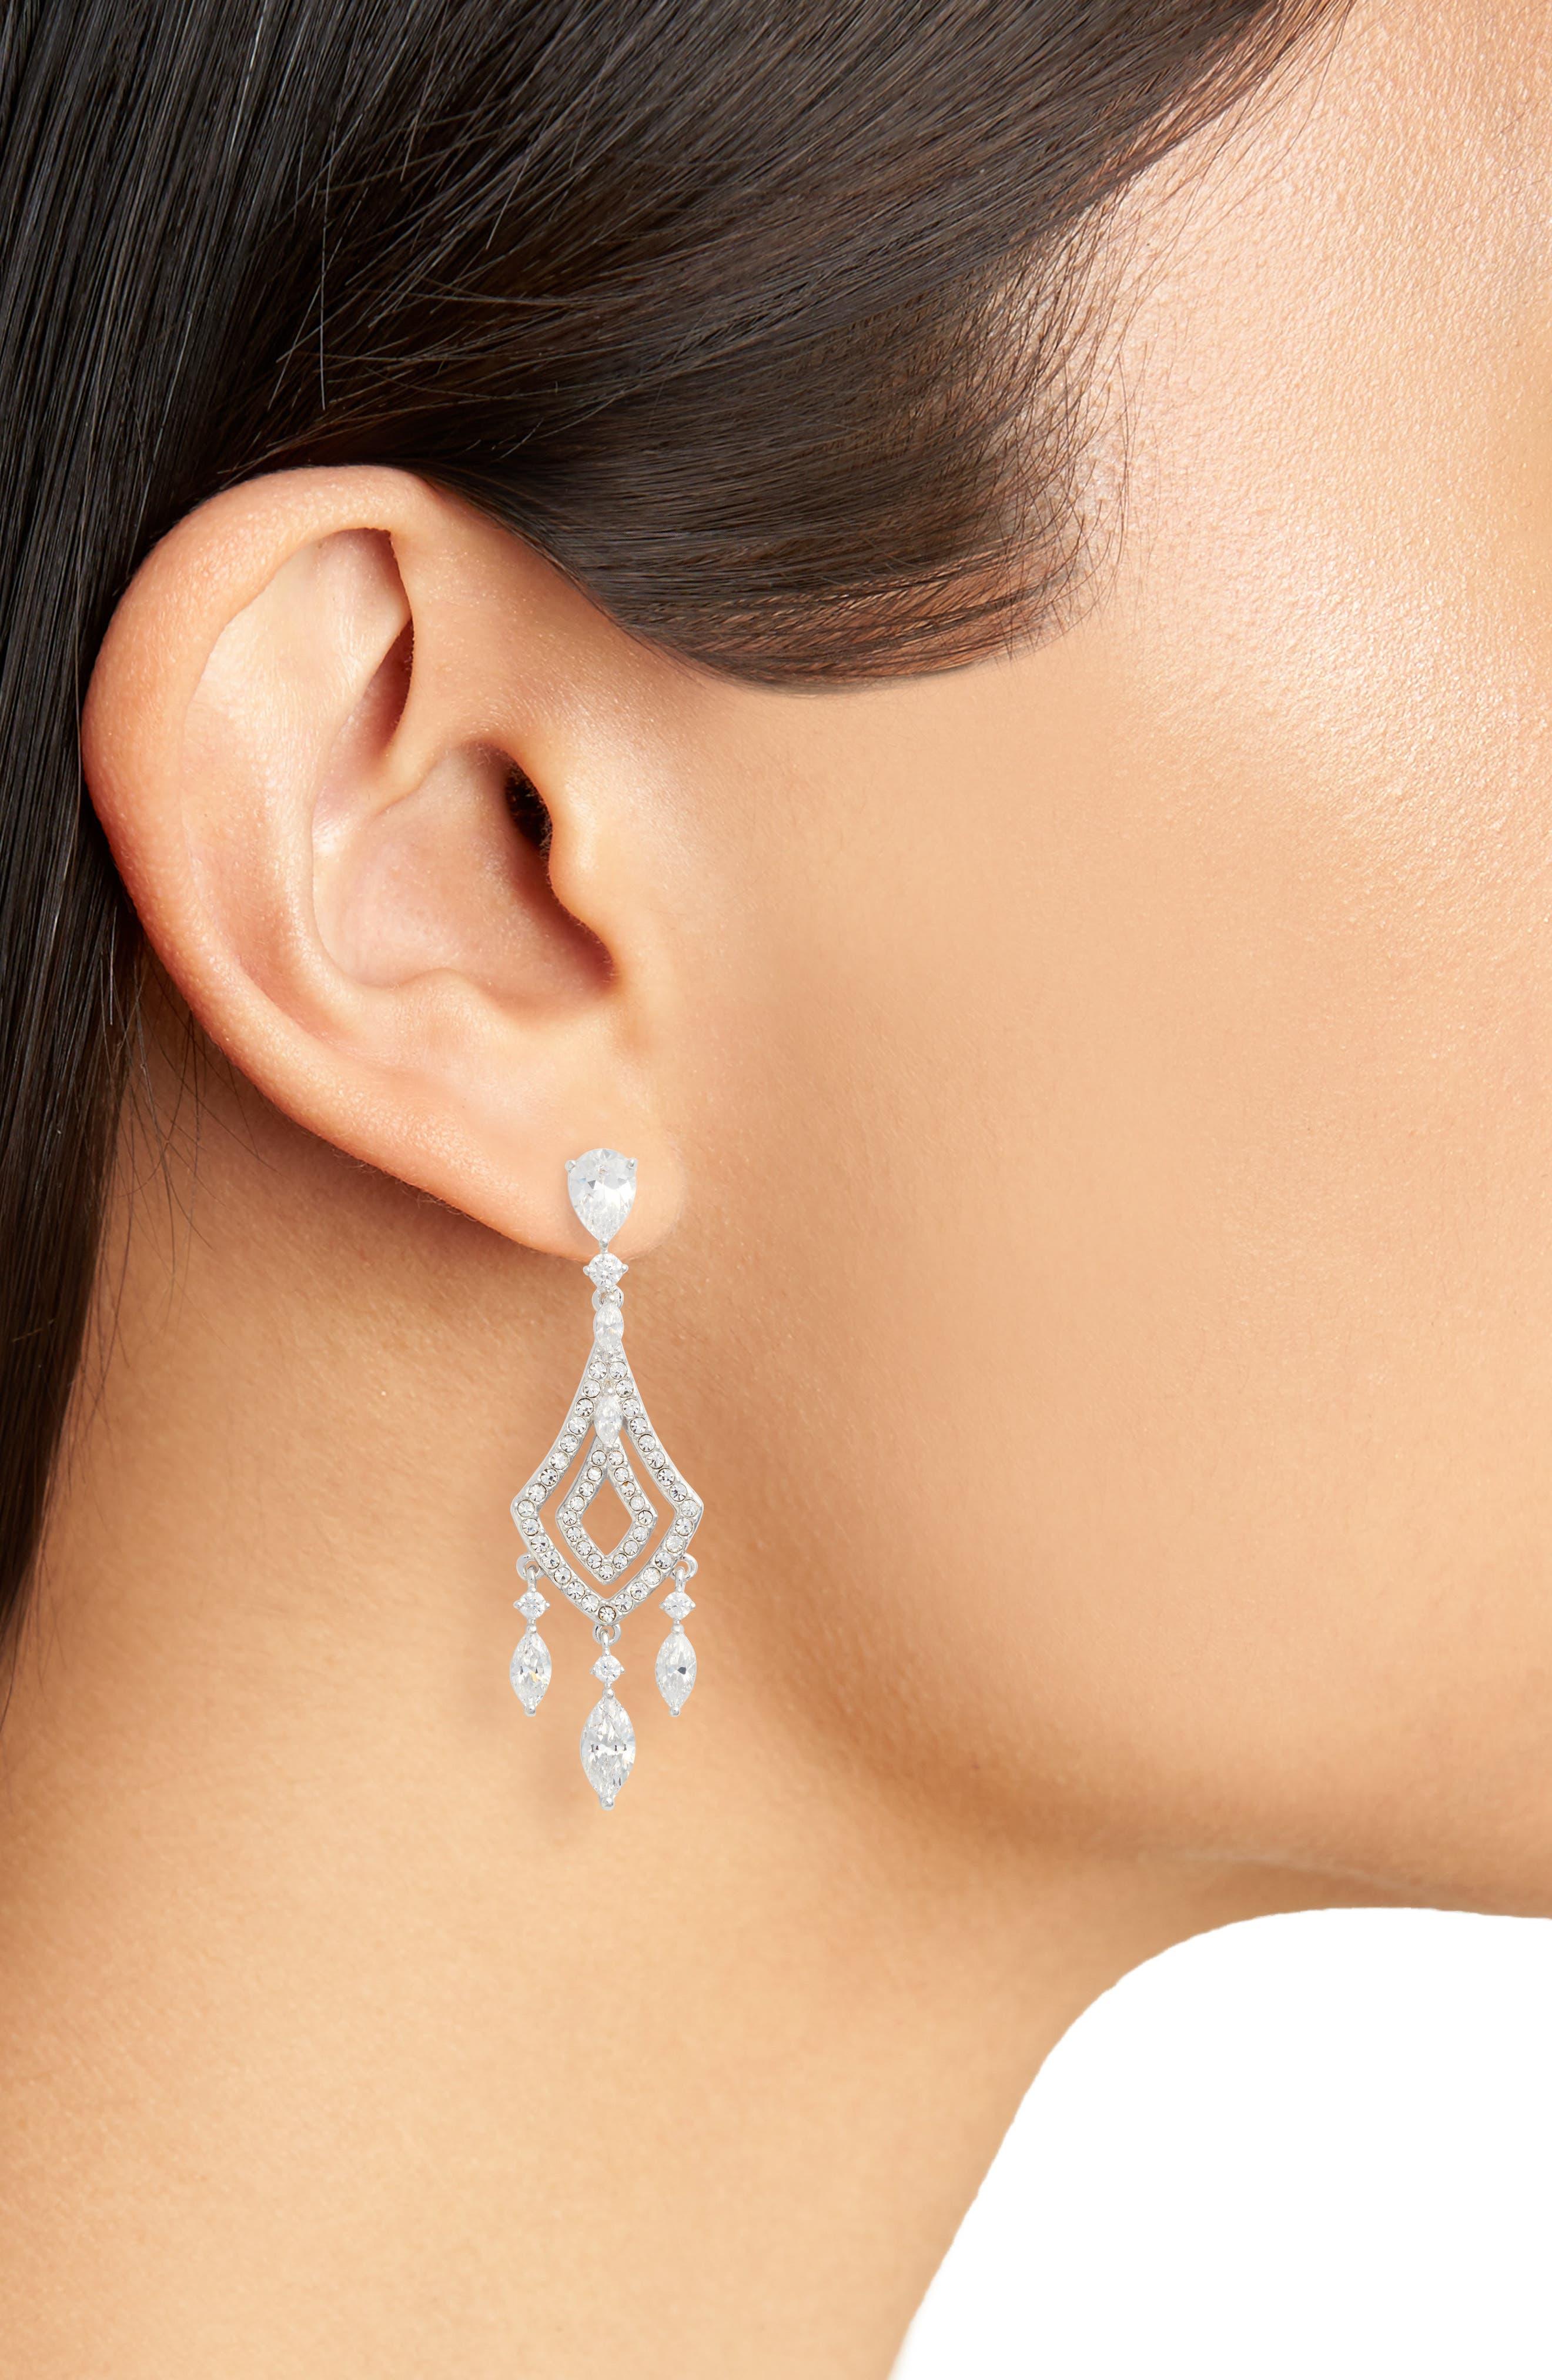 Cubic Zirconia Chandelier Earrings,                             Alternate thumbnail 2, color,                             SILVER